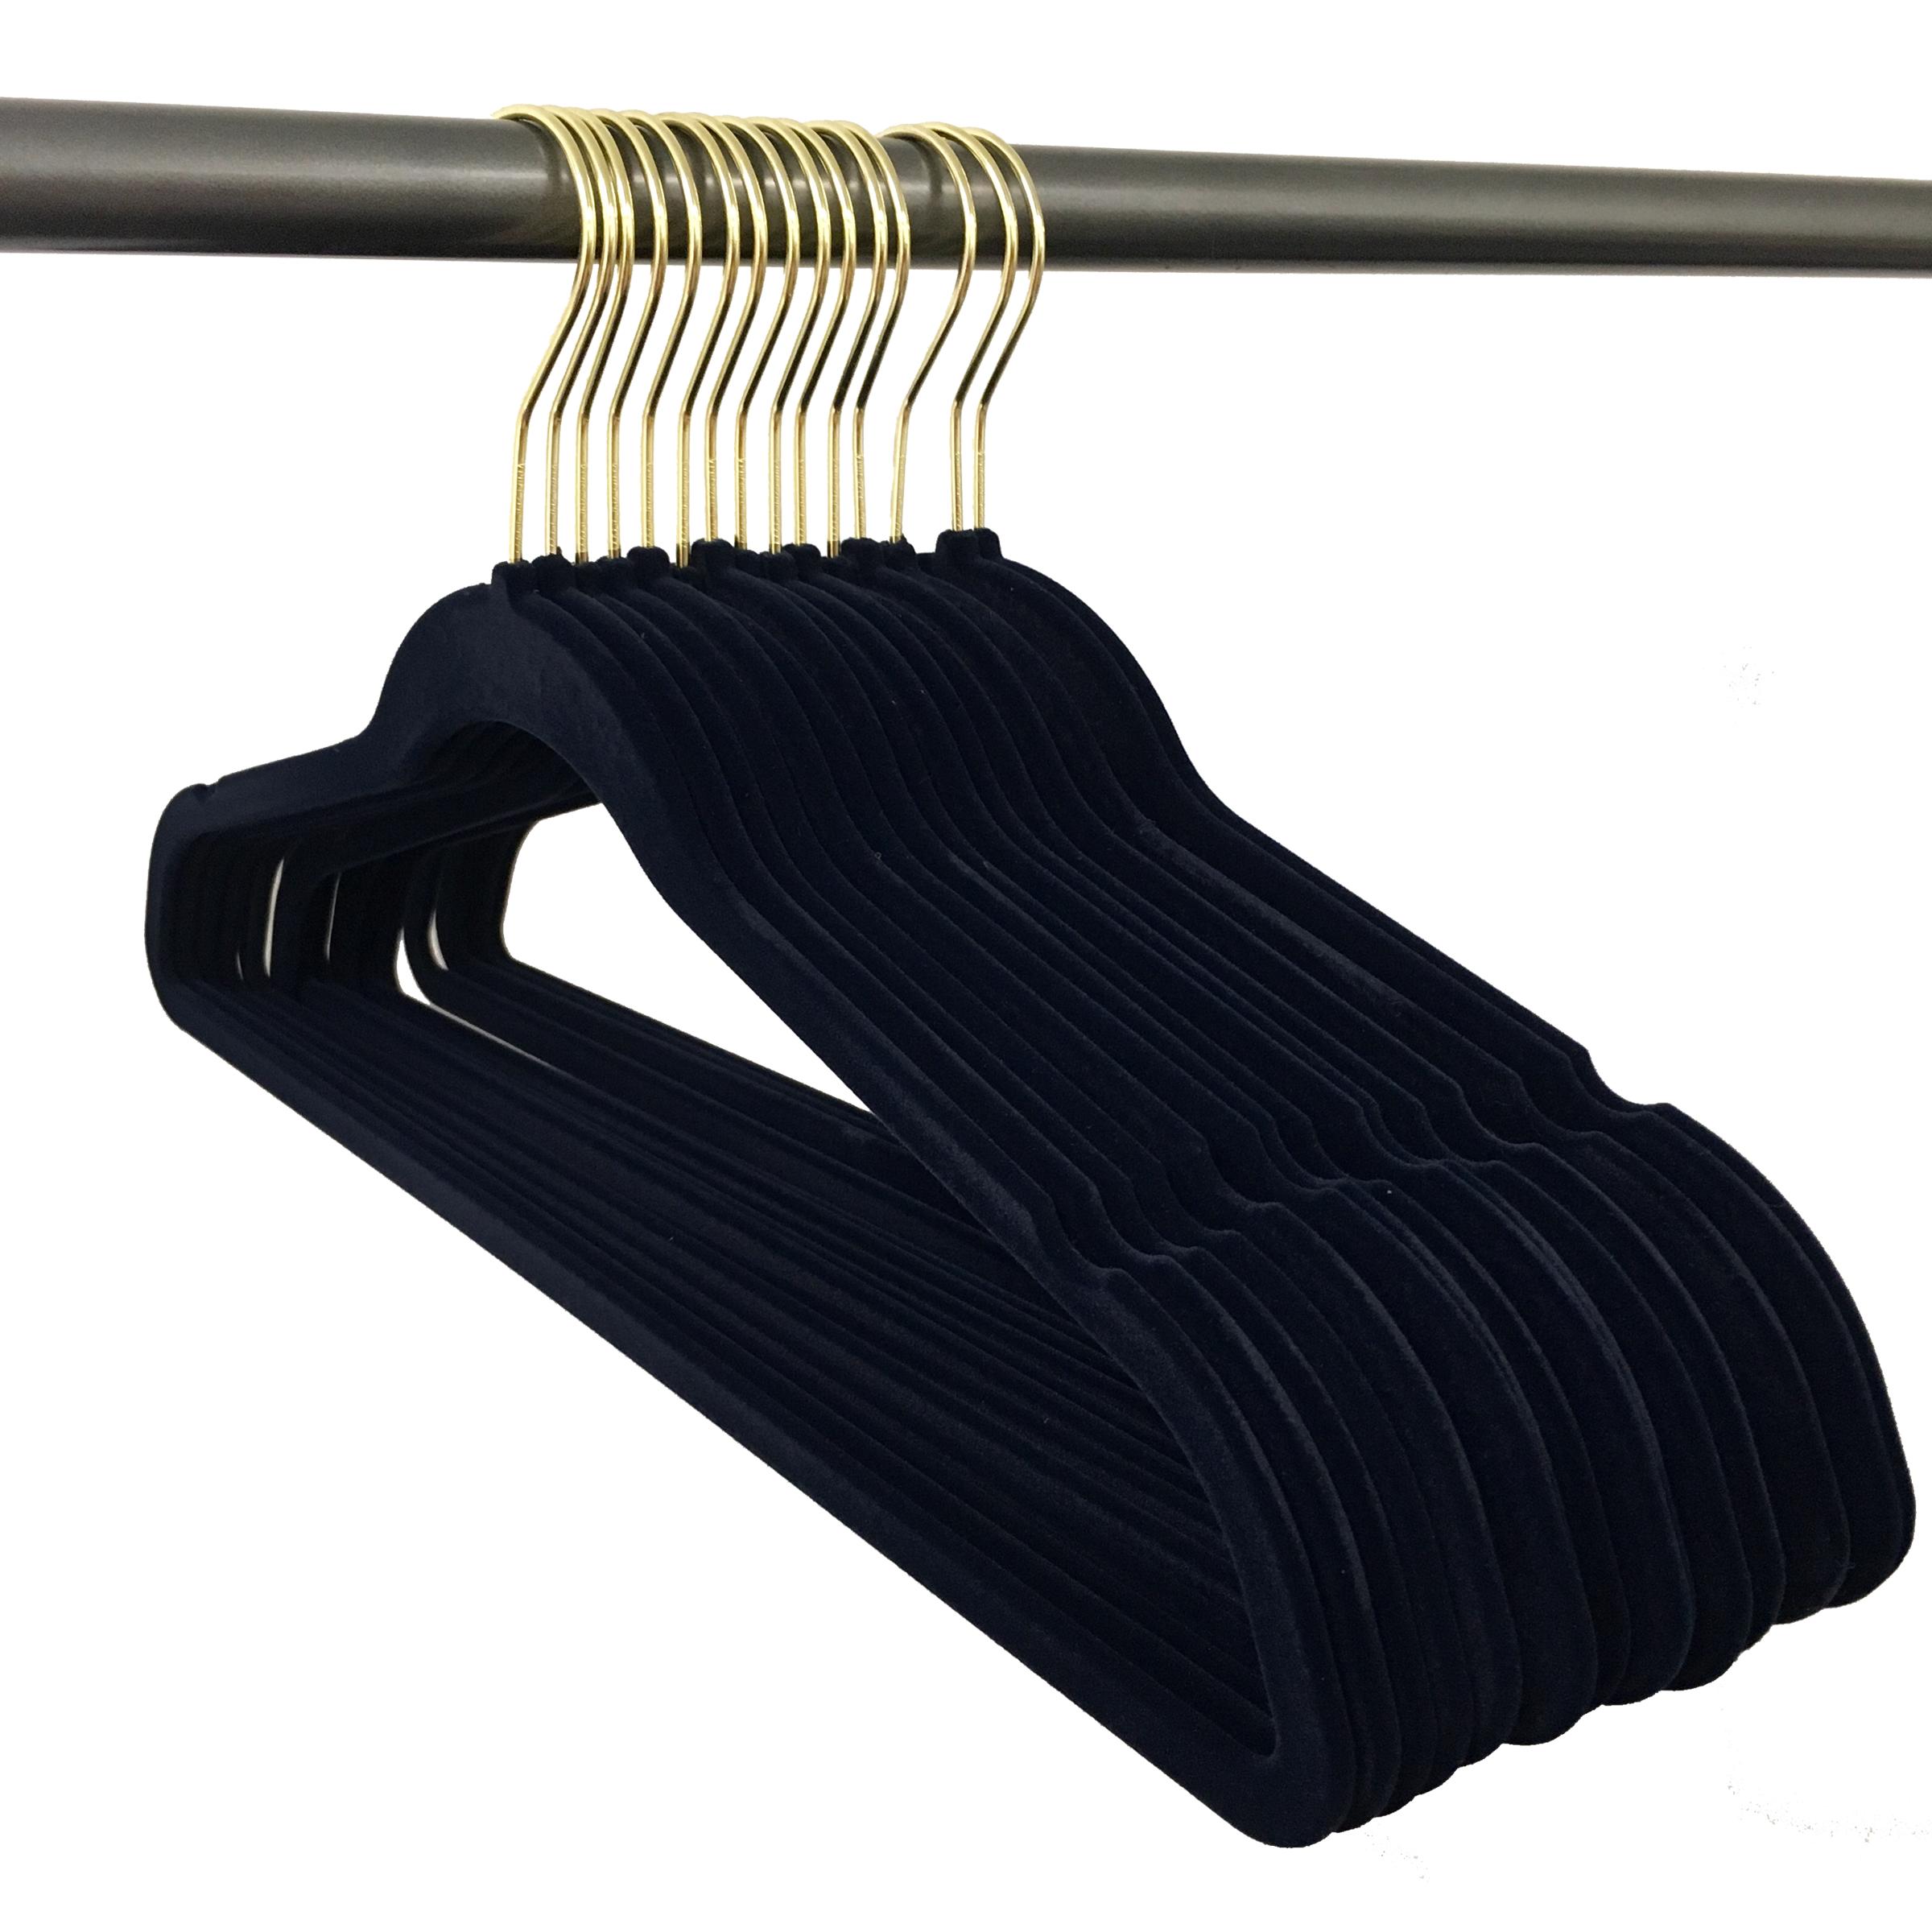 Closet Complete 50 Pack Velvet Hangers; black with Gold hook